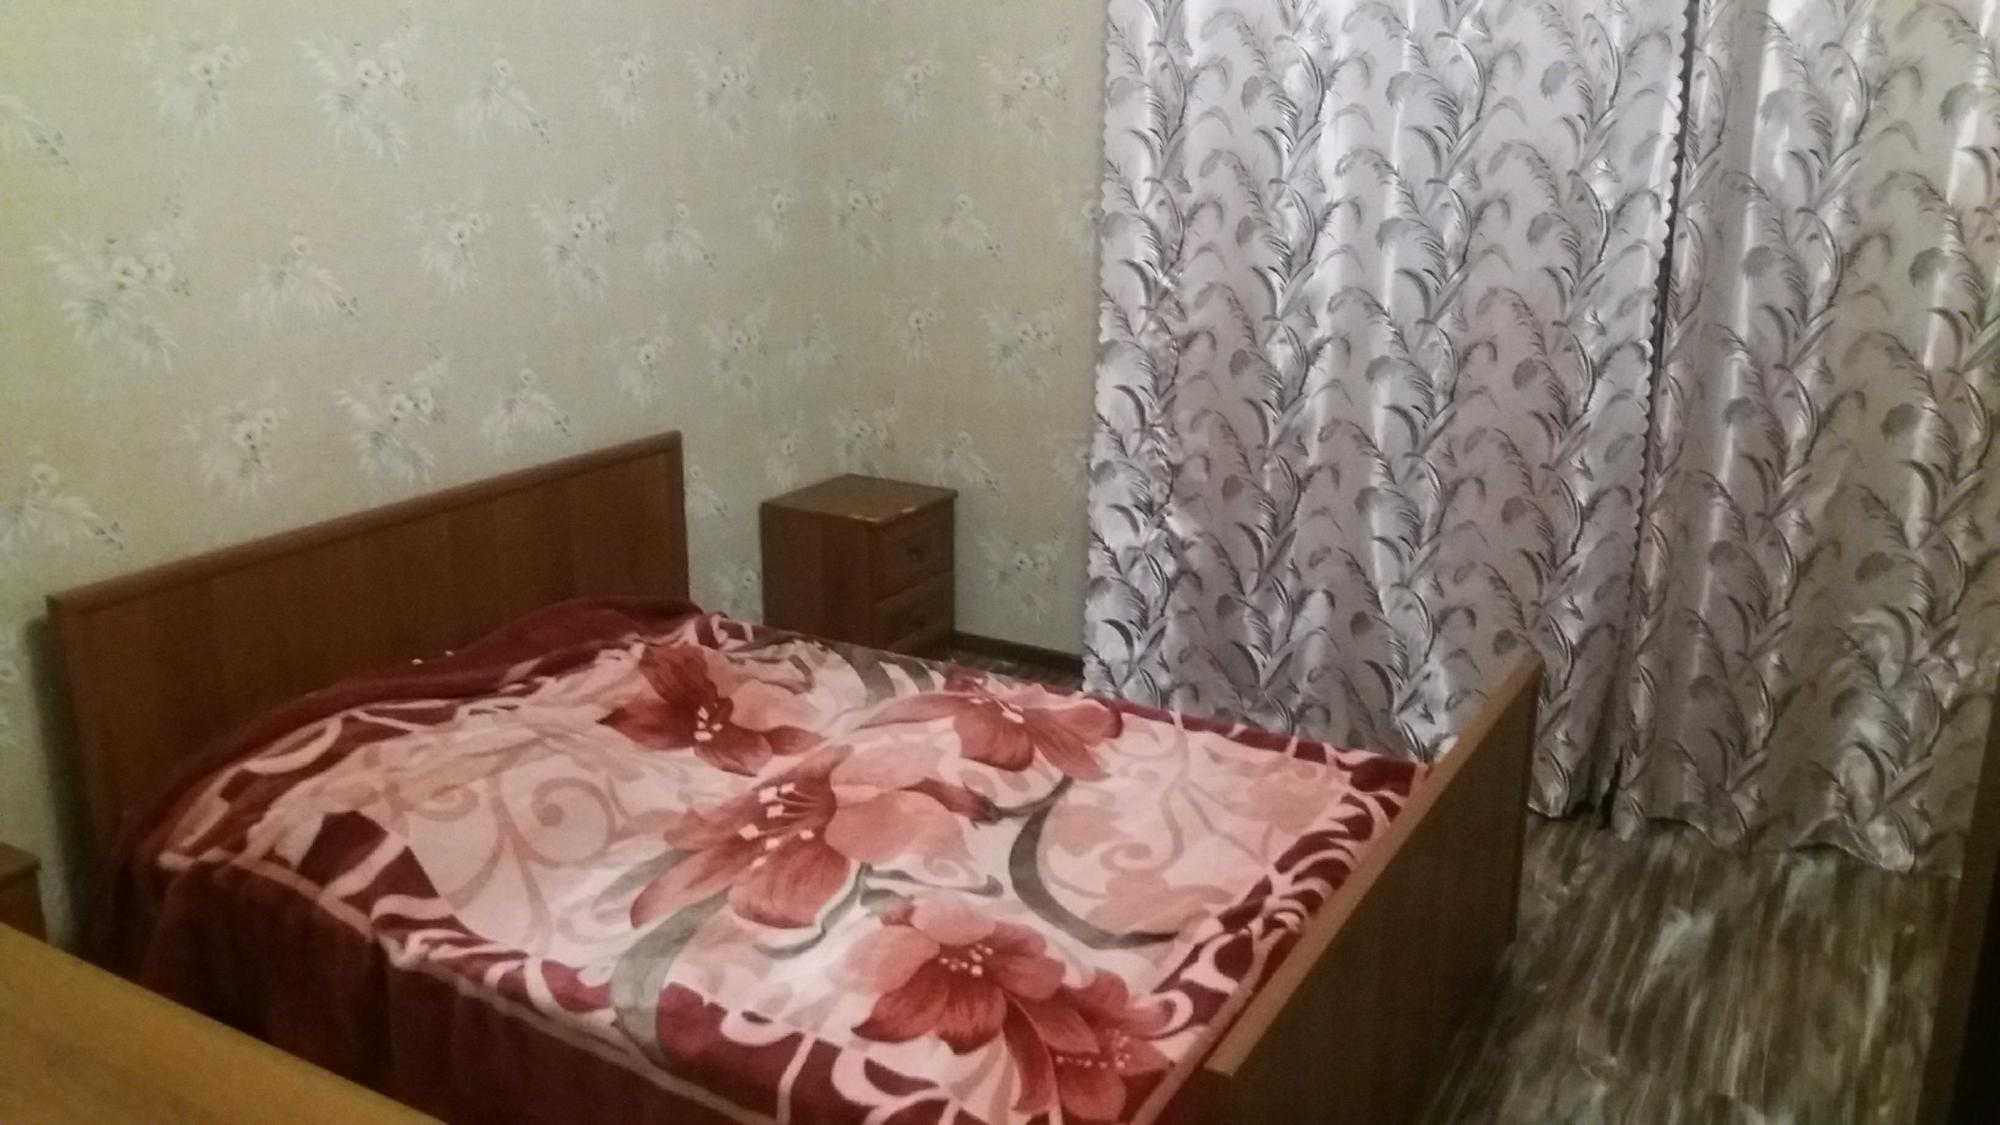 Квартира, 1 комната, 42 м² в Домодедово 89057005352 купить 2